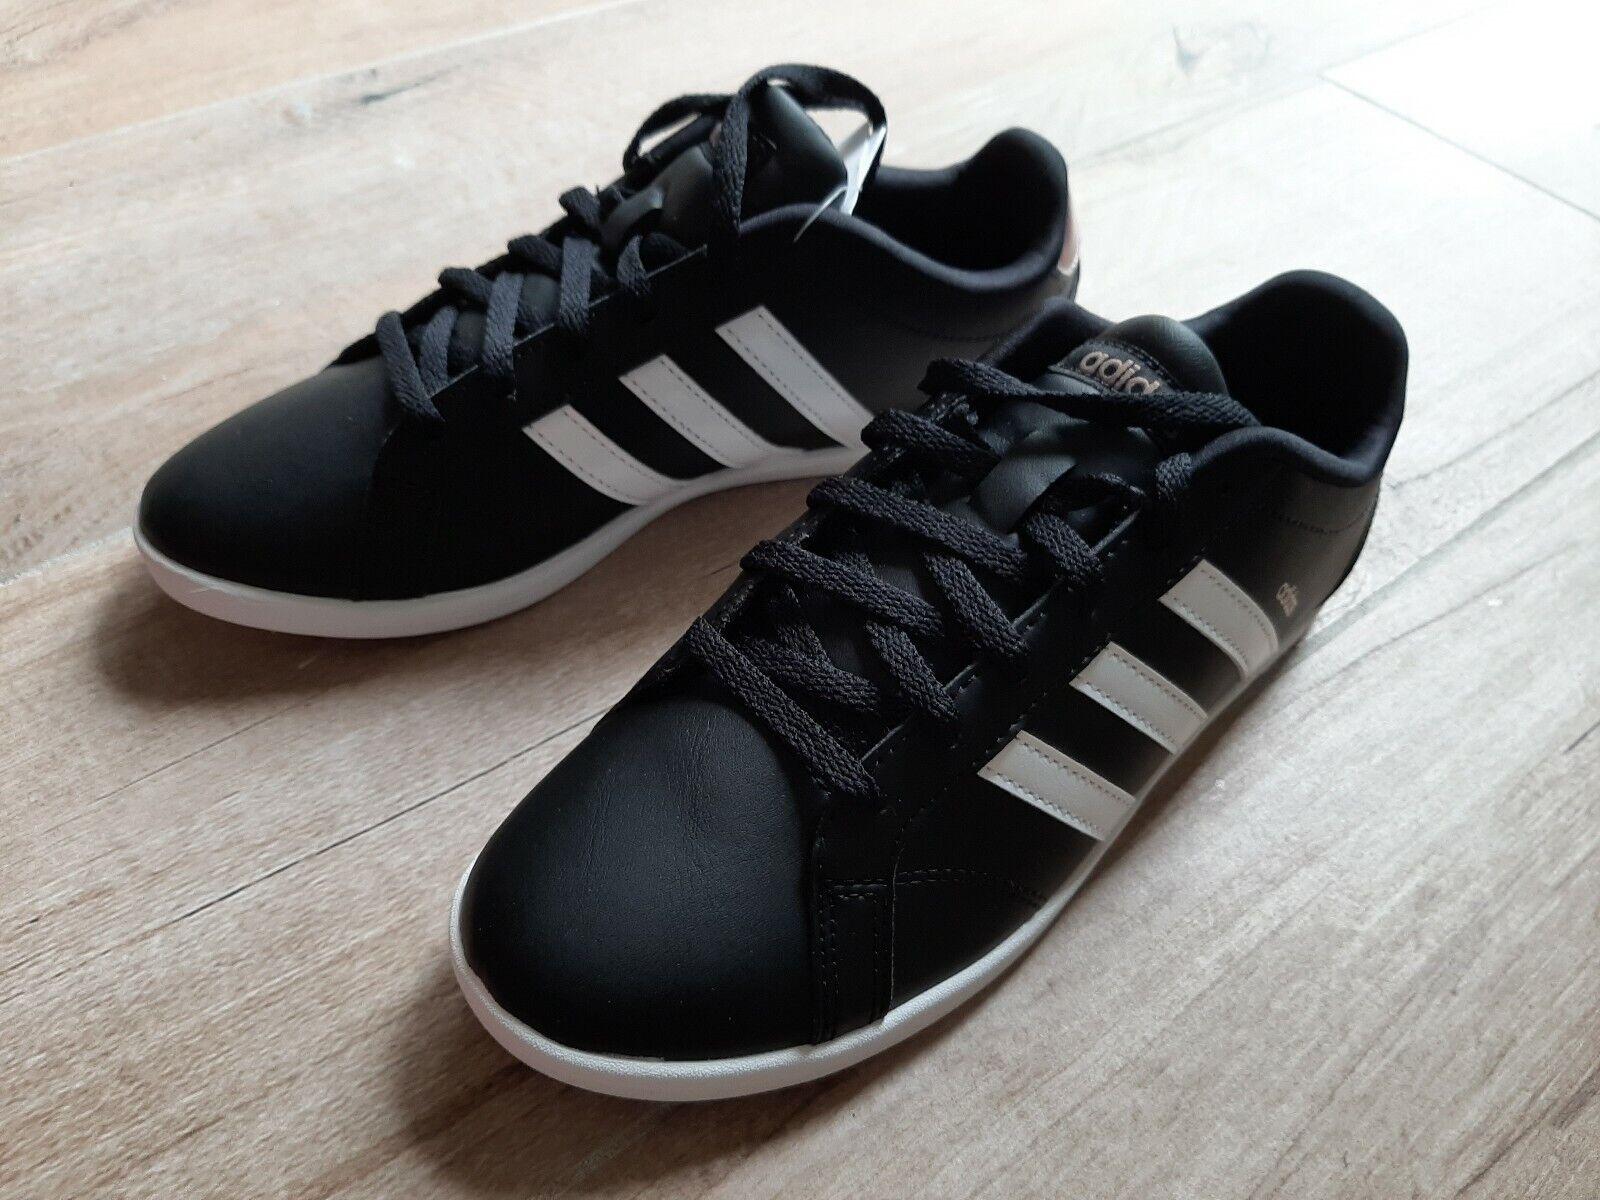 Adidas VS coneo QT W DB0126 Turnschuhe Leder Gr. 37 1 3 UK 4,5 schwarz Neu damen